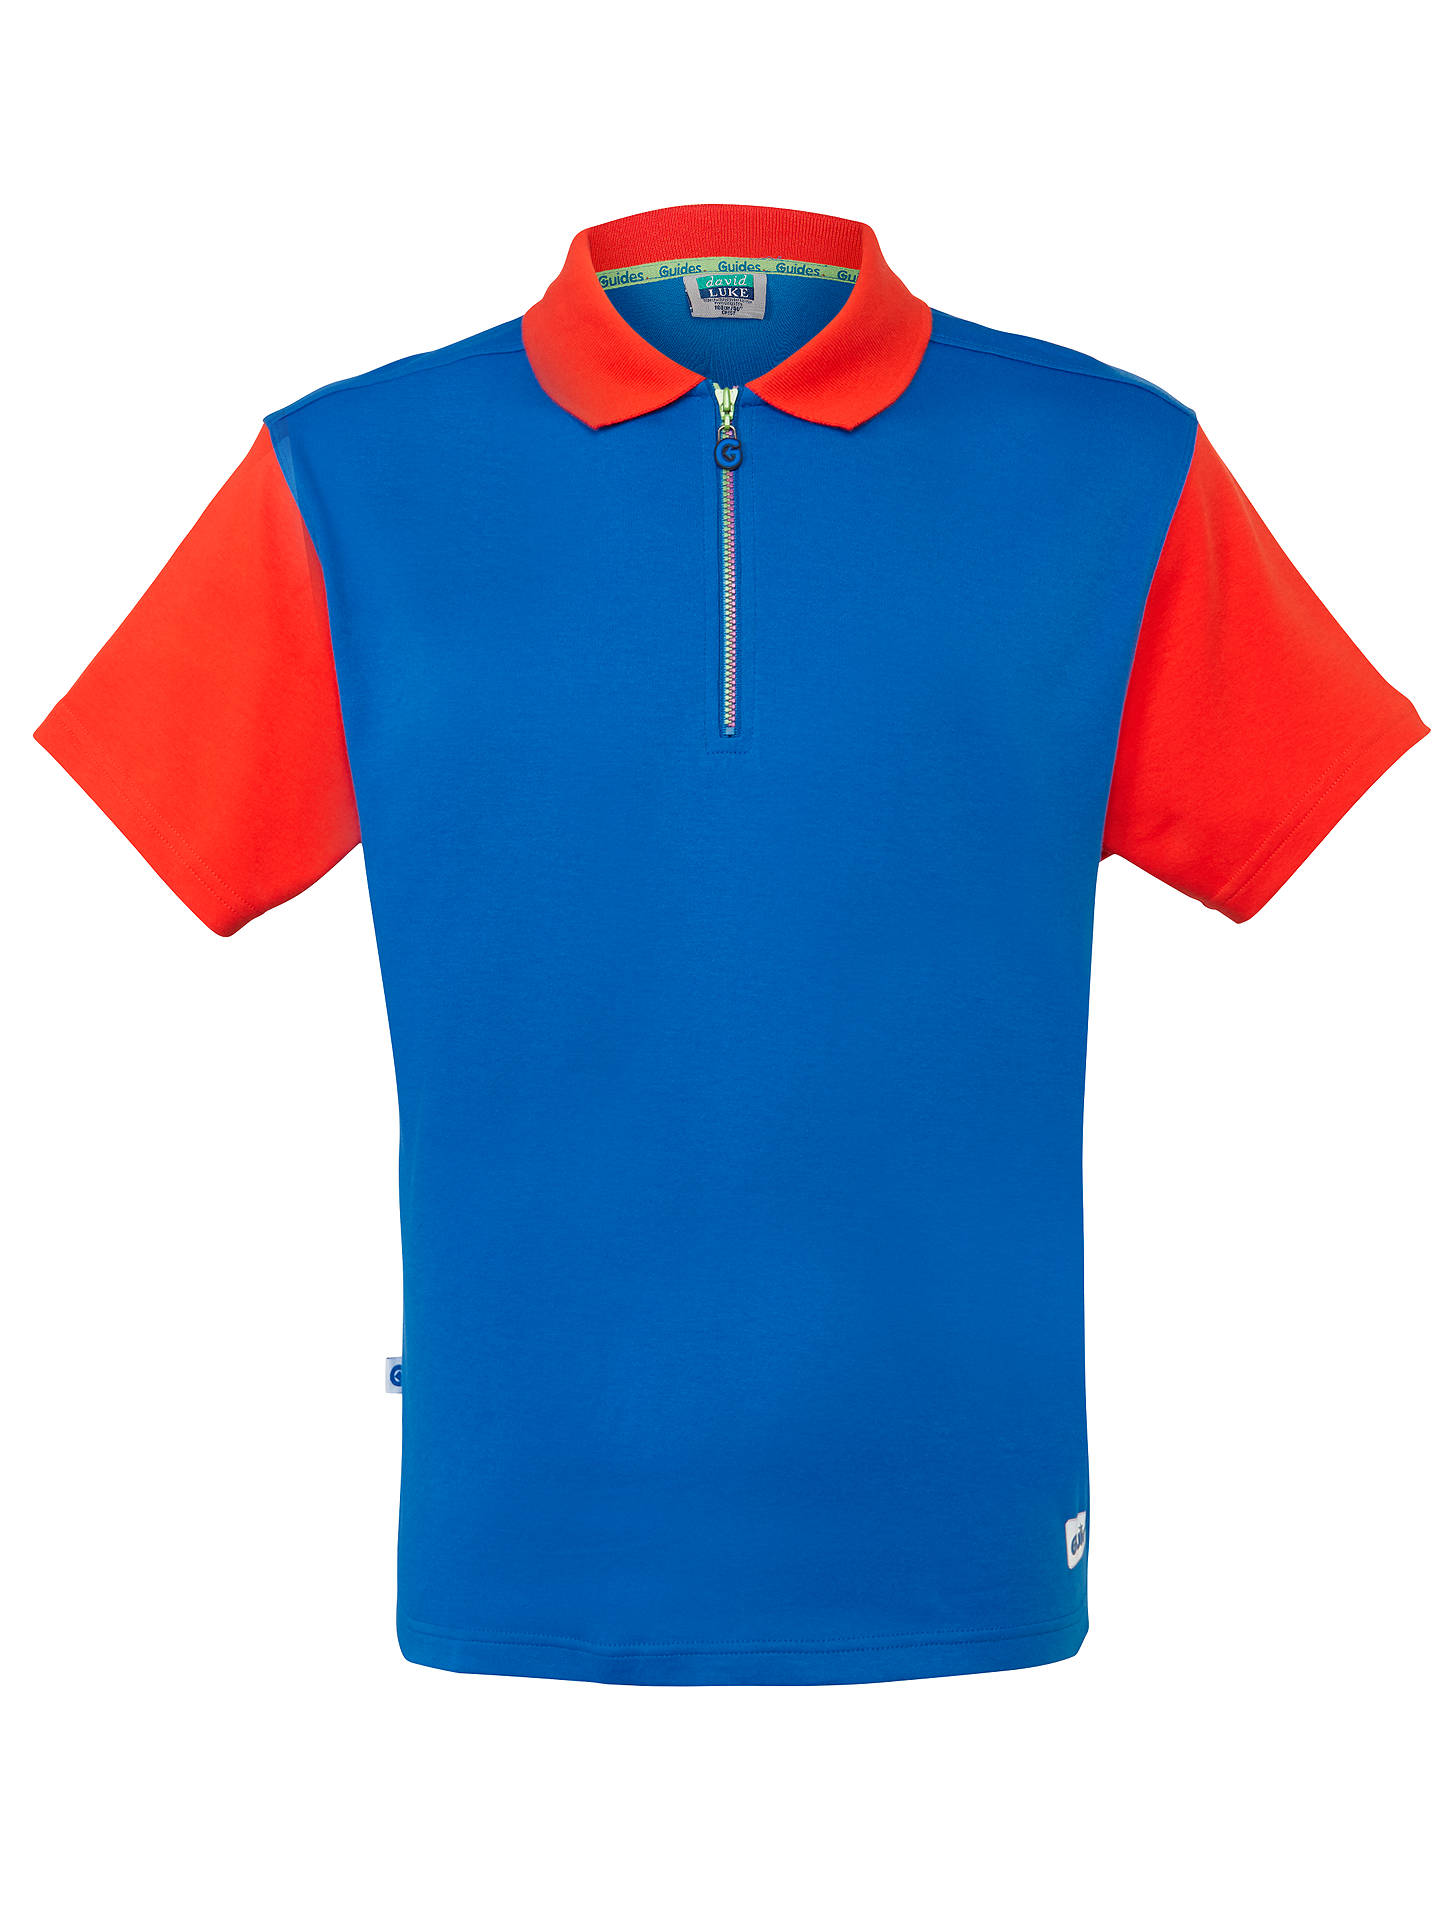 allineamento boschi Facile  Girl Guide Polo Shirt, Red/Royal Blue at John Lewis & Partners